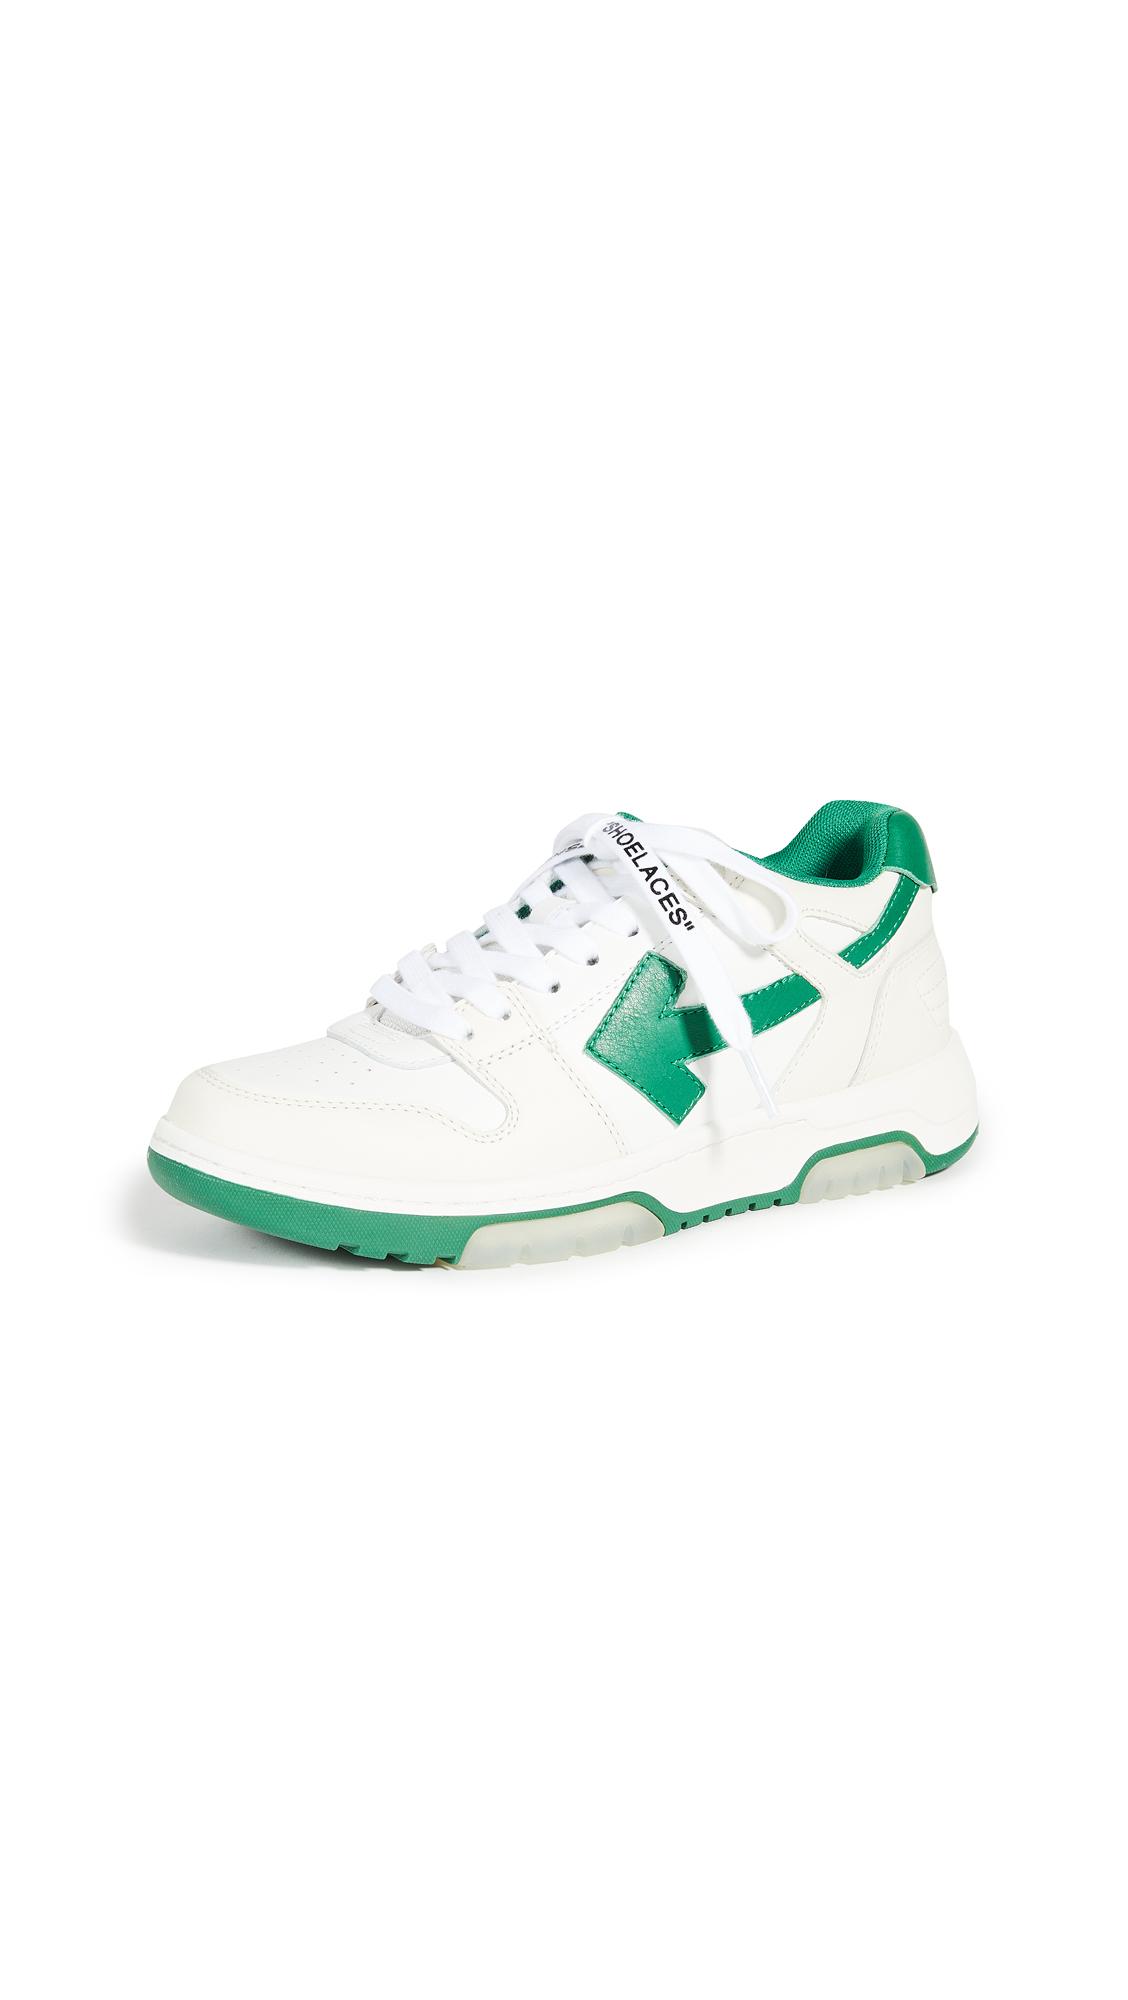 Off-White OOO Sneakers